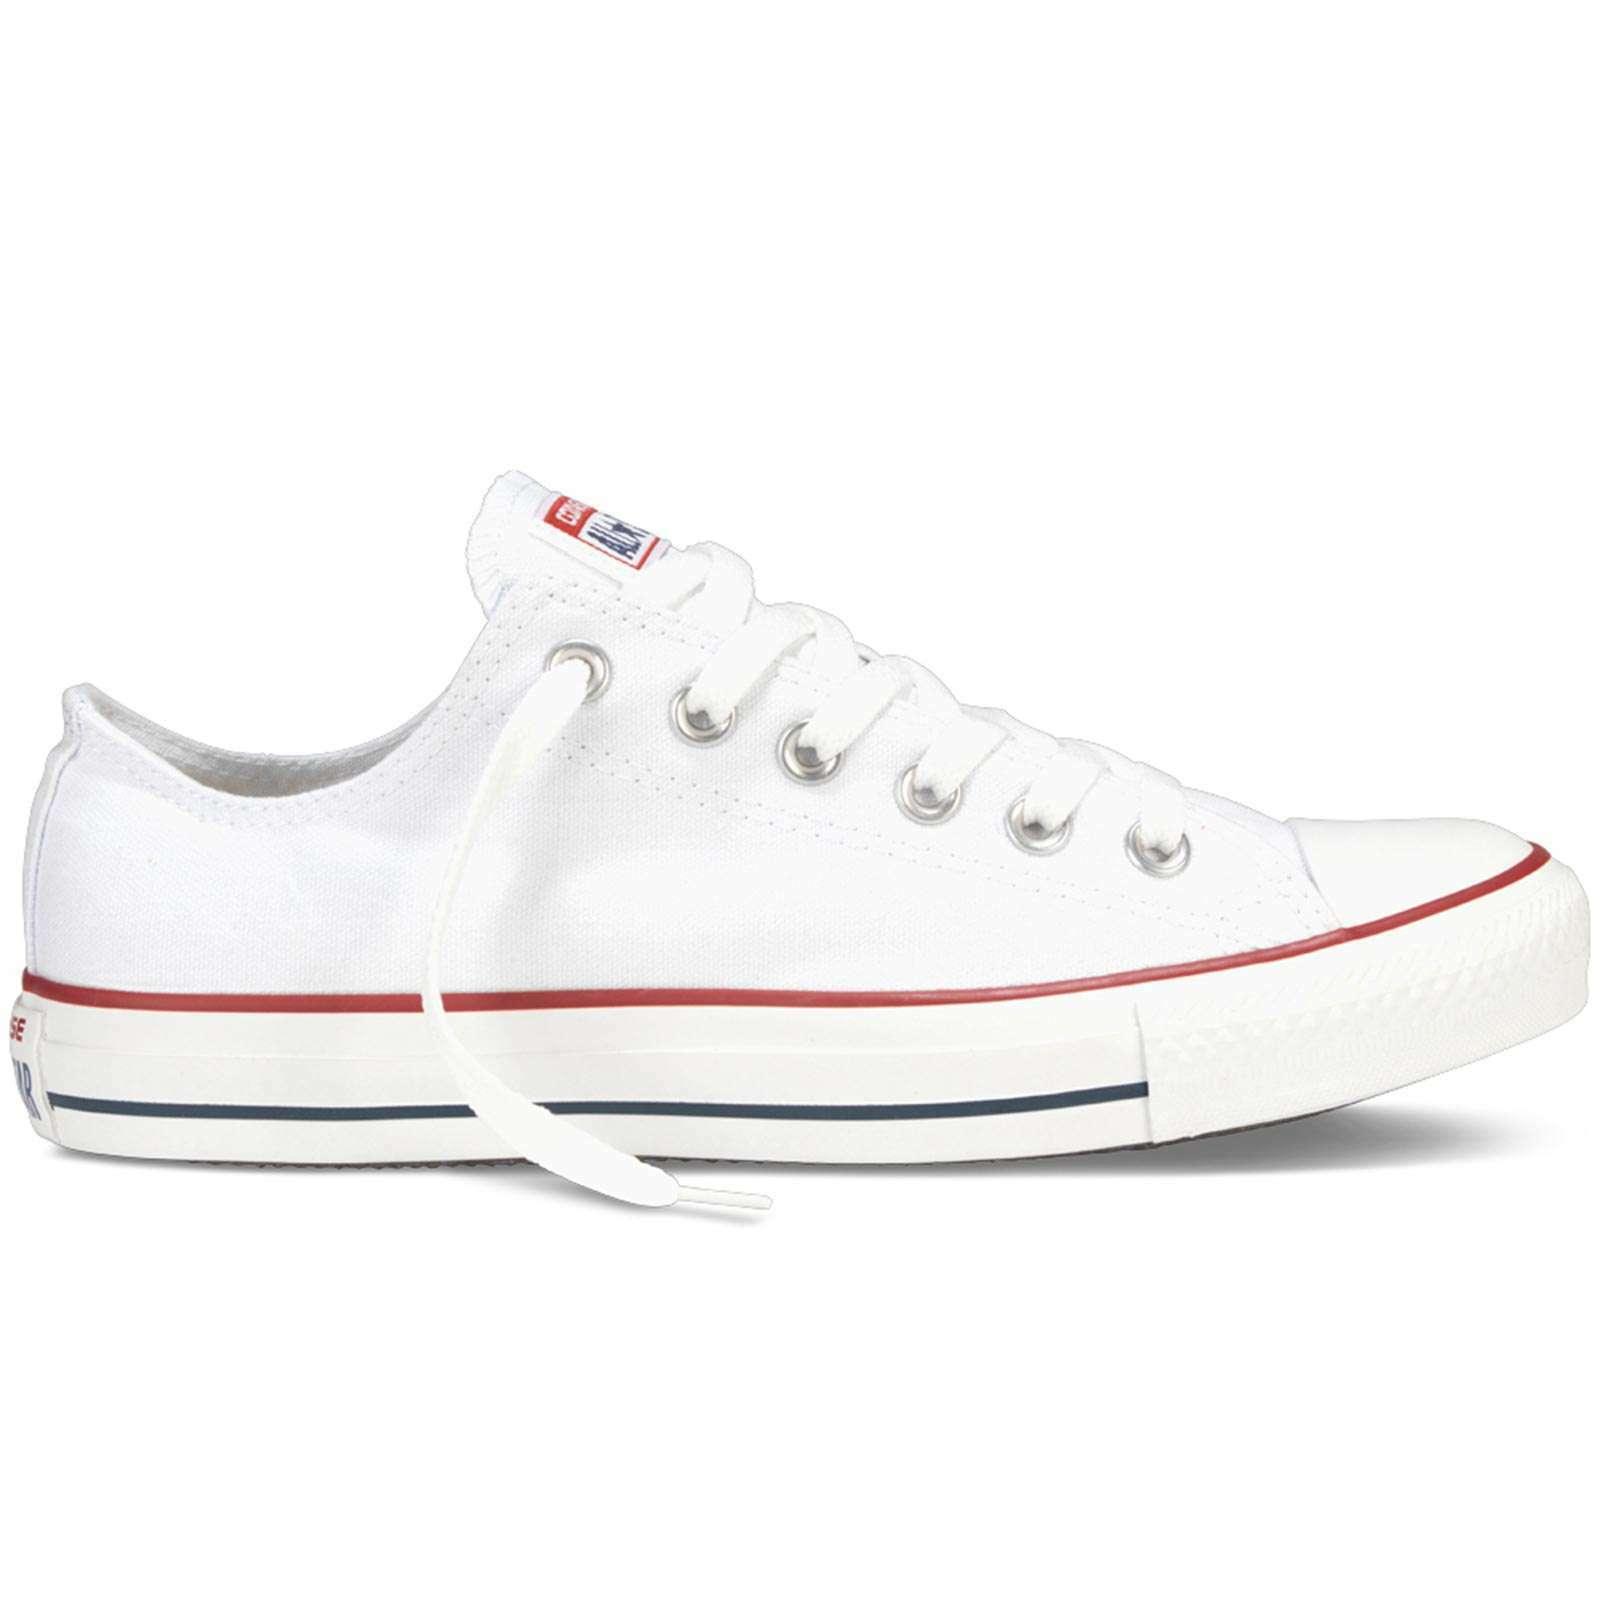 zapatillas CONVERSE Chuck TaylorAll Star zapatos zapatos zapatos Basse hombres mujer M7652C BIANCO 391432